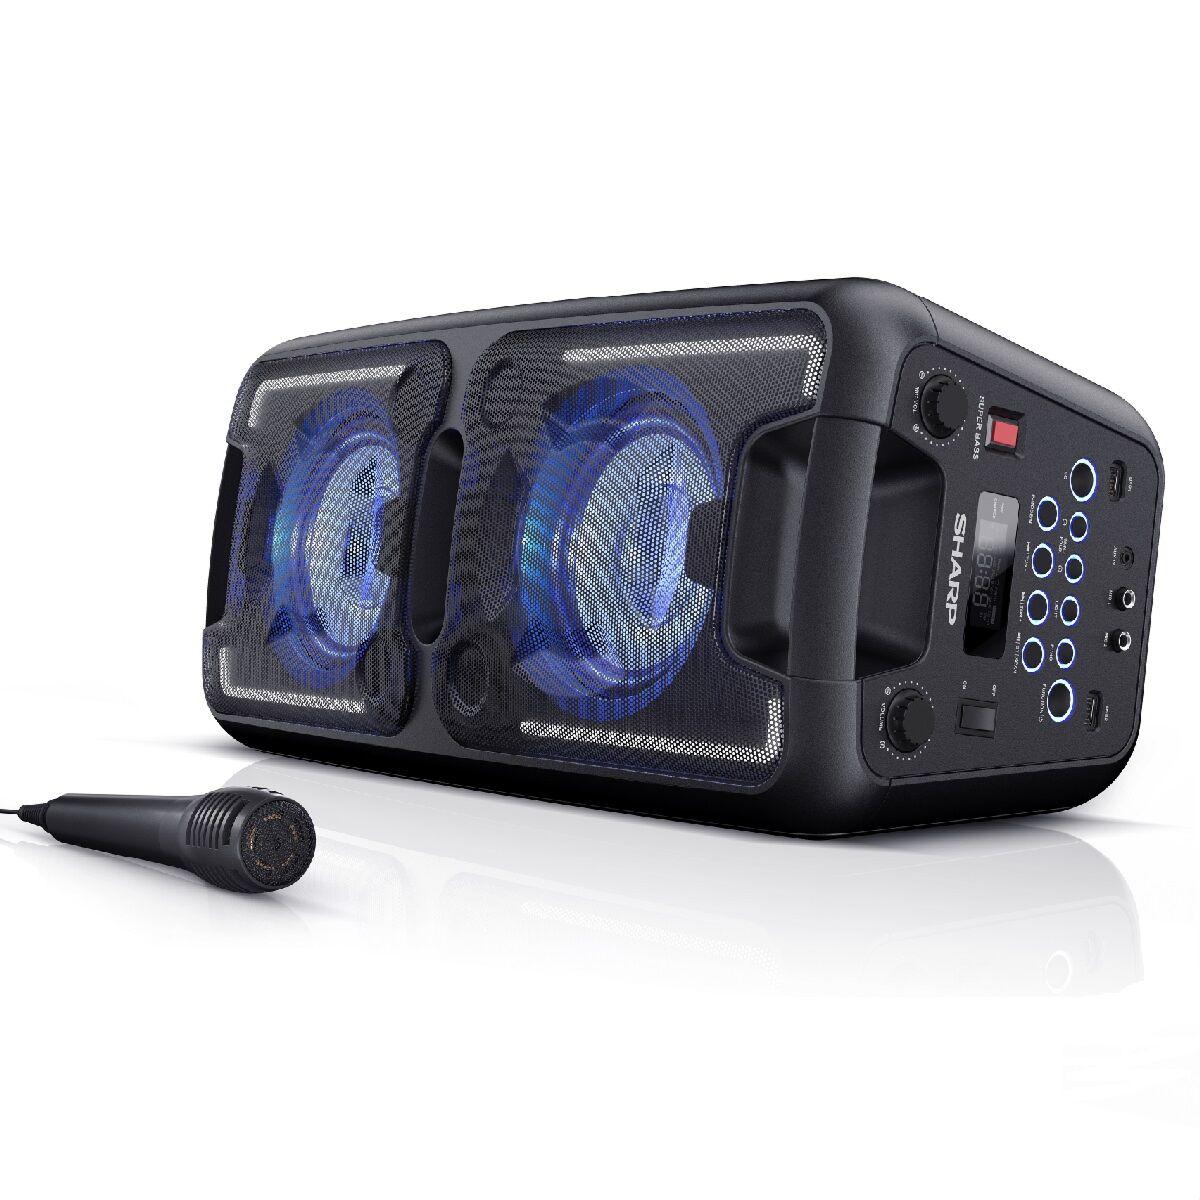 Sharp PS-920 Bluetooth Portable Party Speaker - Black - £84.99 @ Robert Dyas